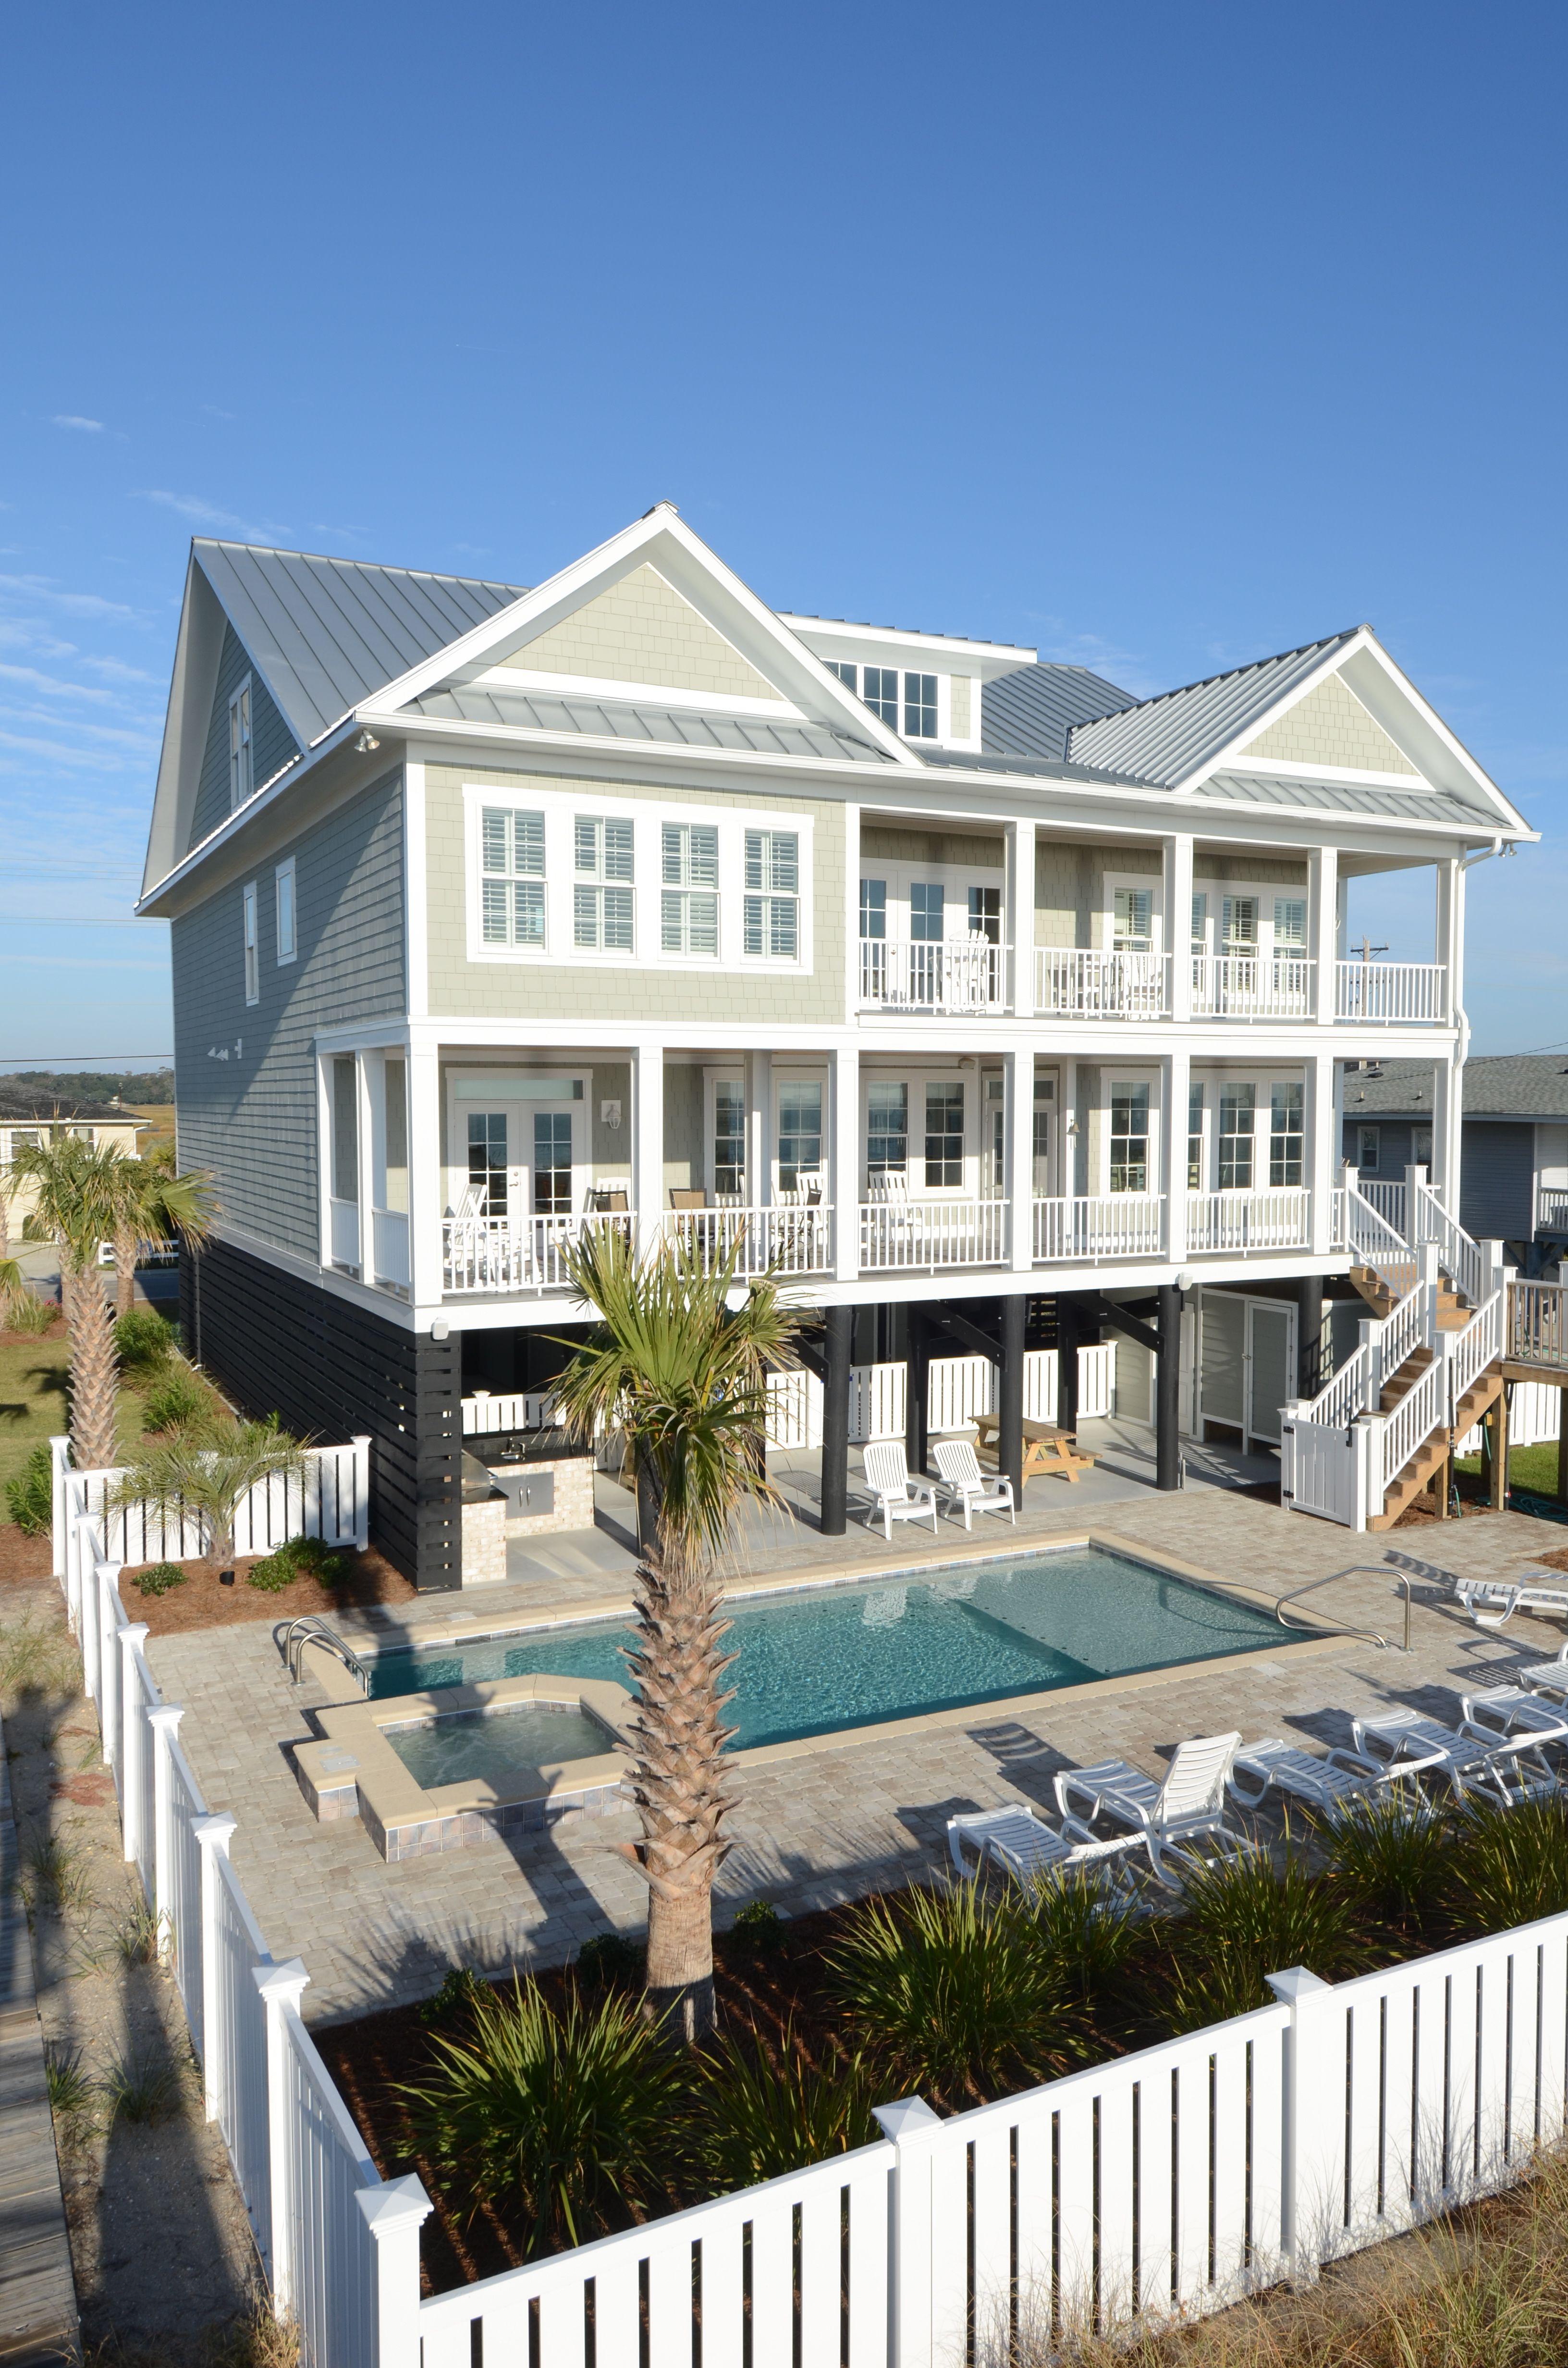 Crg Construction Custom Built Oceanfront Home In Garden City Beach Sc Garden City Beach Build Your Dream Home Garden City